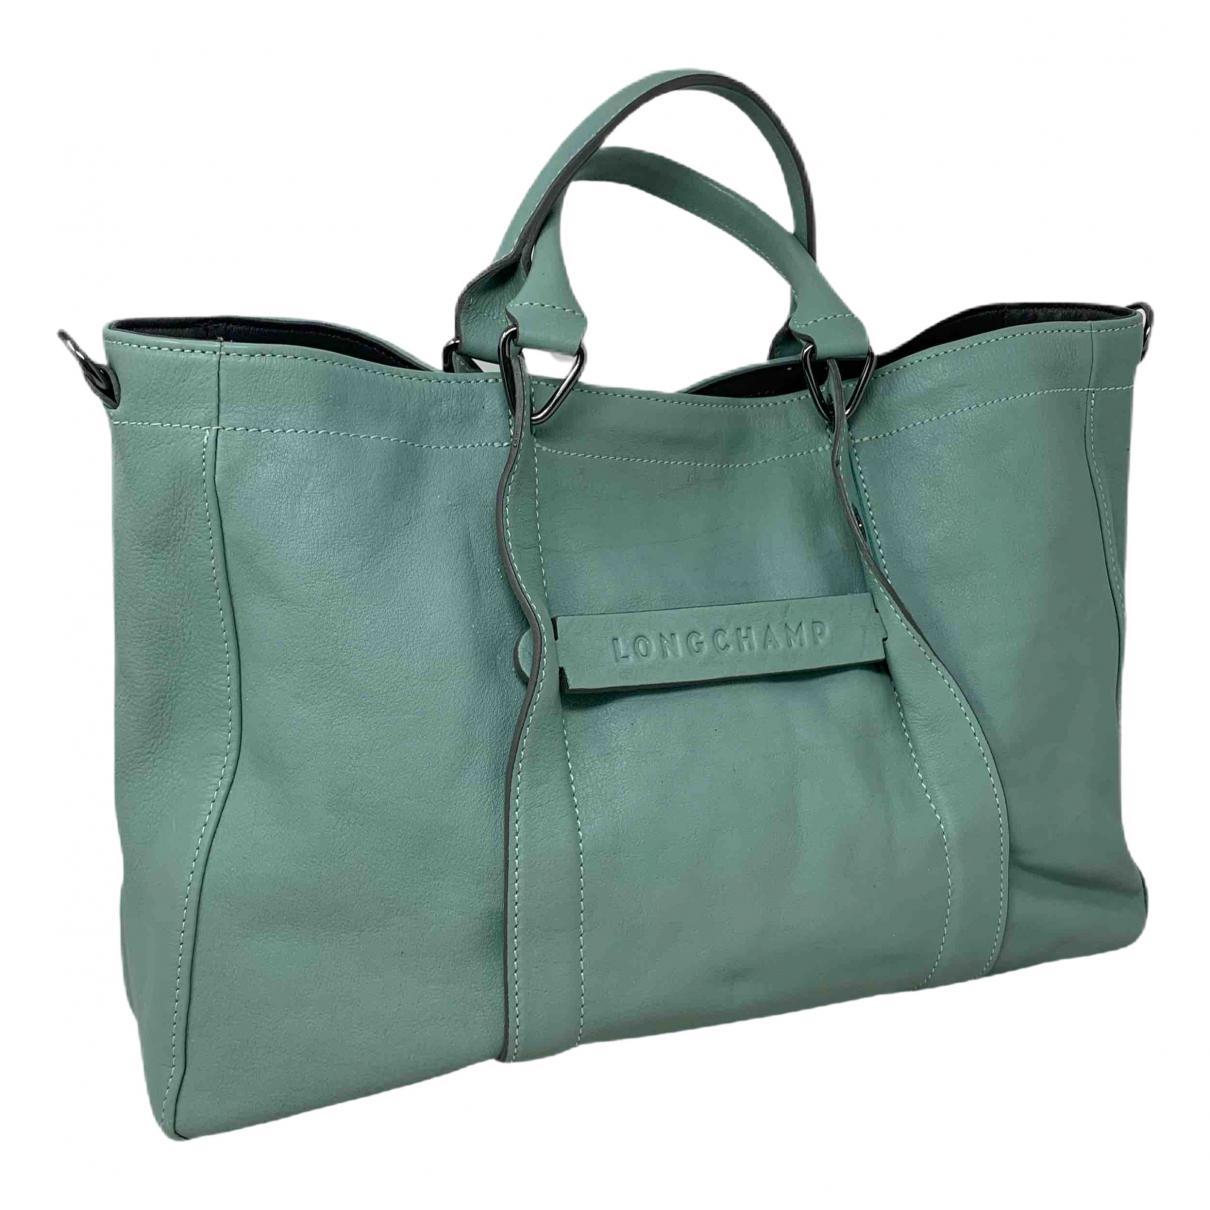 Longchamp 3D Handtasche in Leder